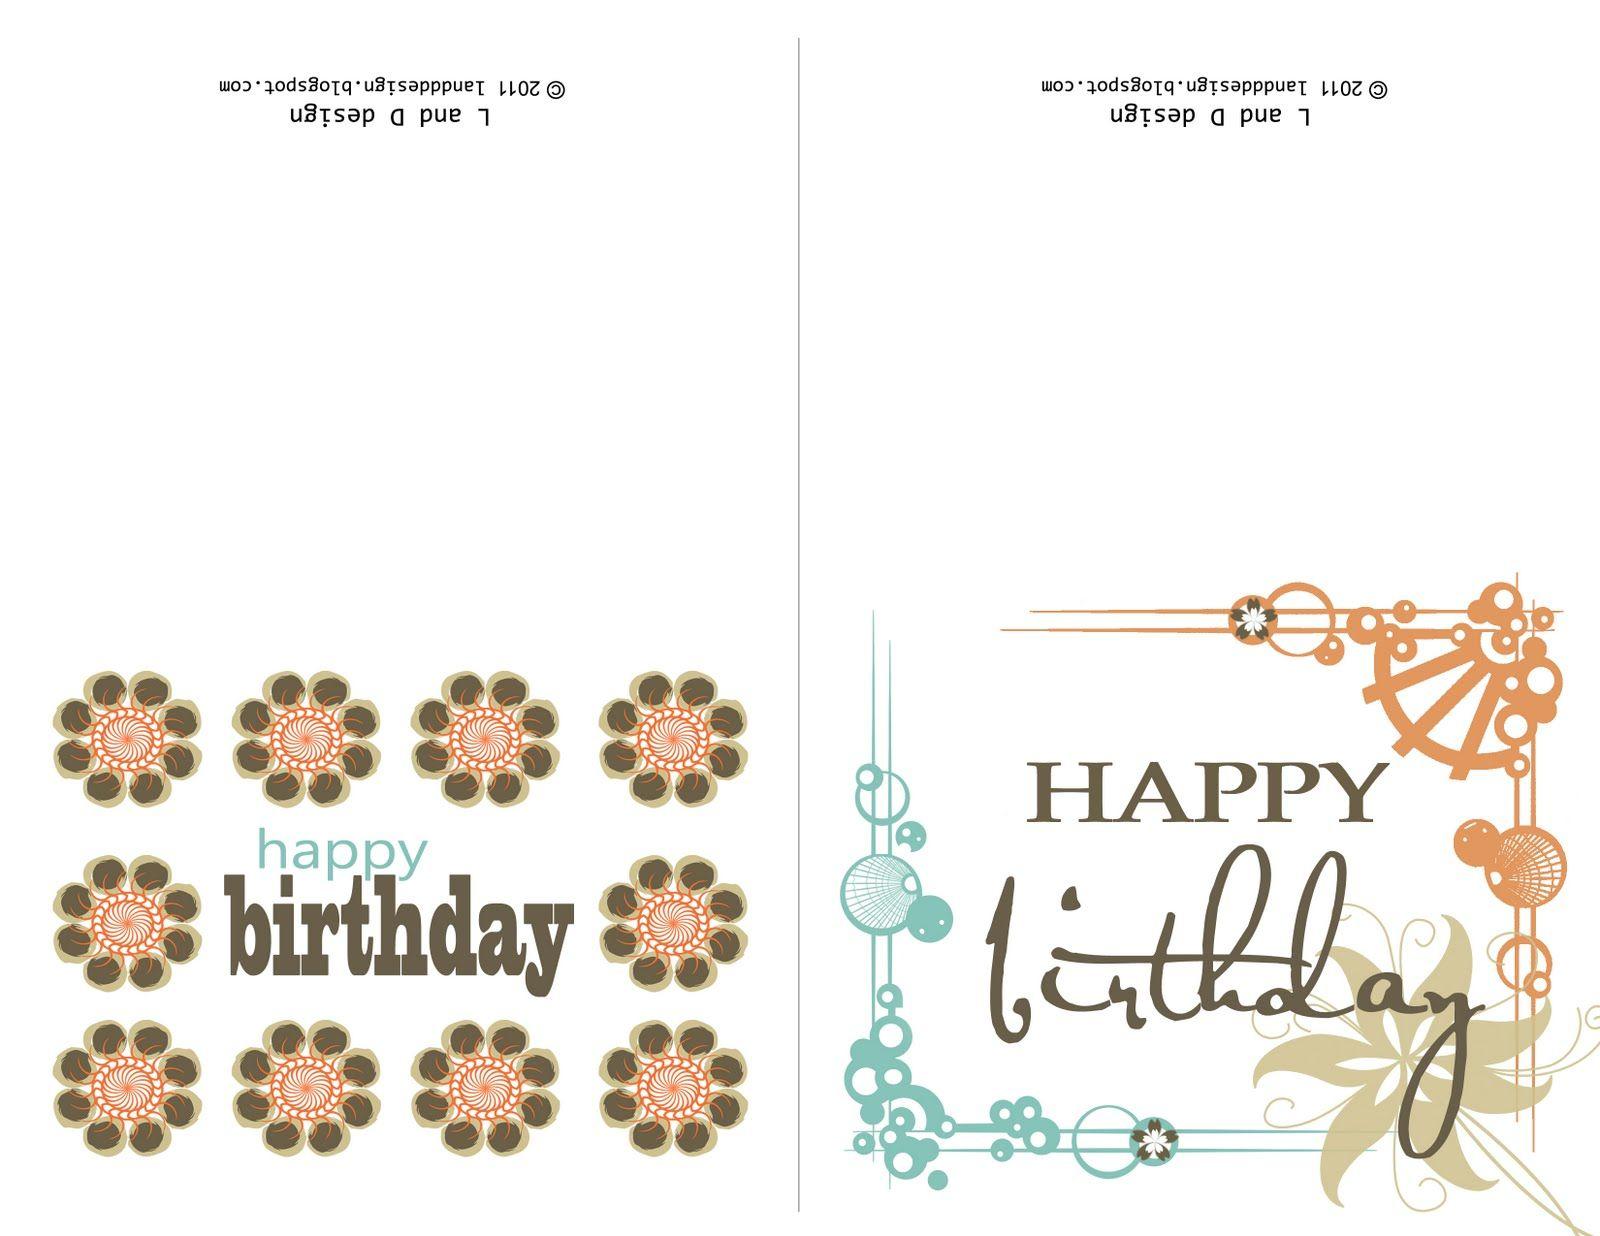 Printable Birthday Cards For Mom   Happy Birthday To You   Pinterest - Free Printable Birthday Cards For Mom